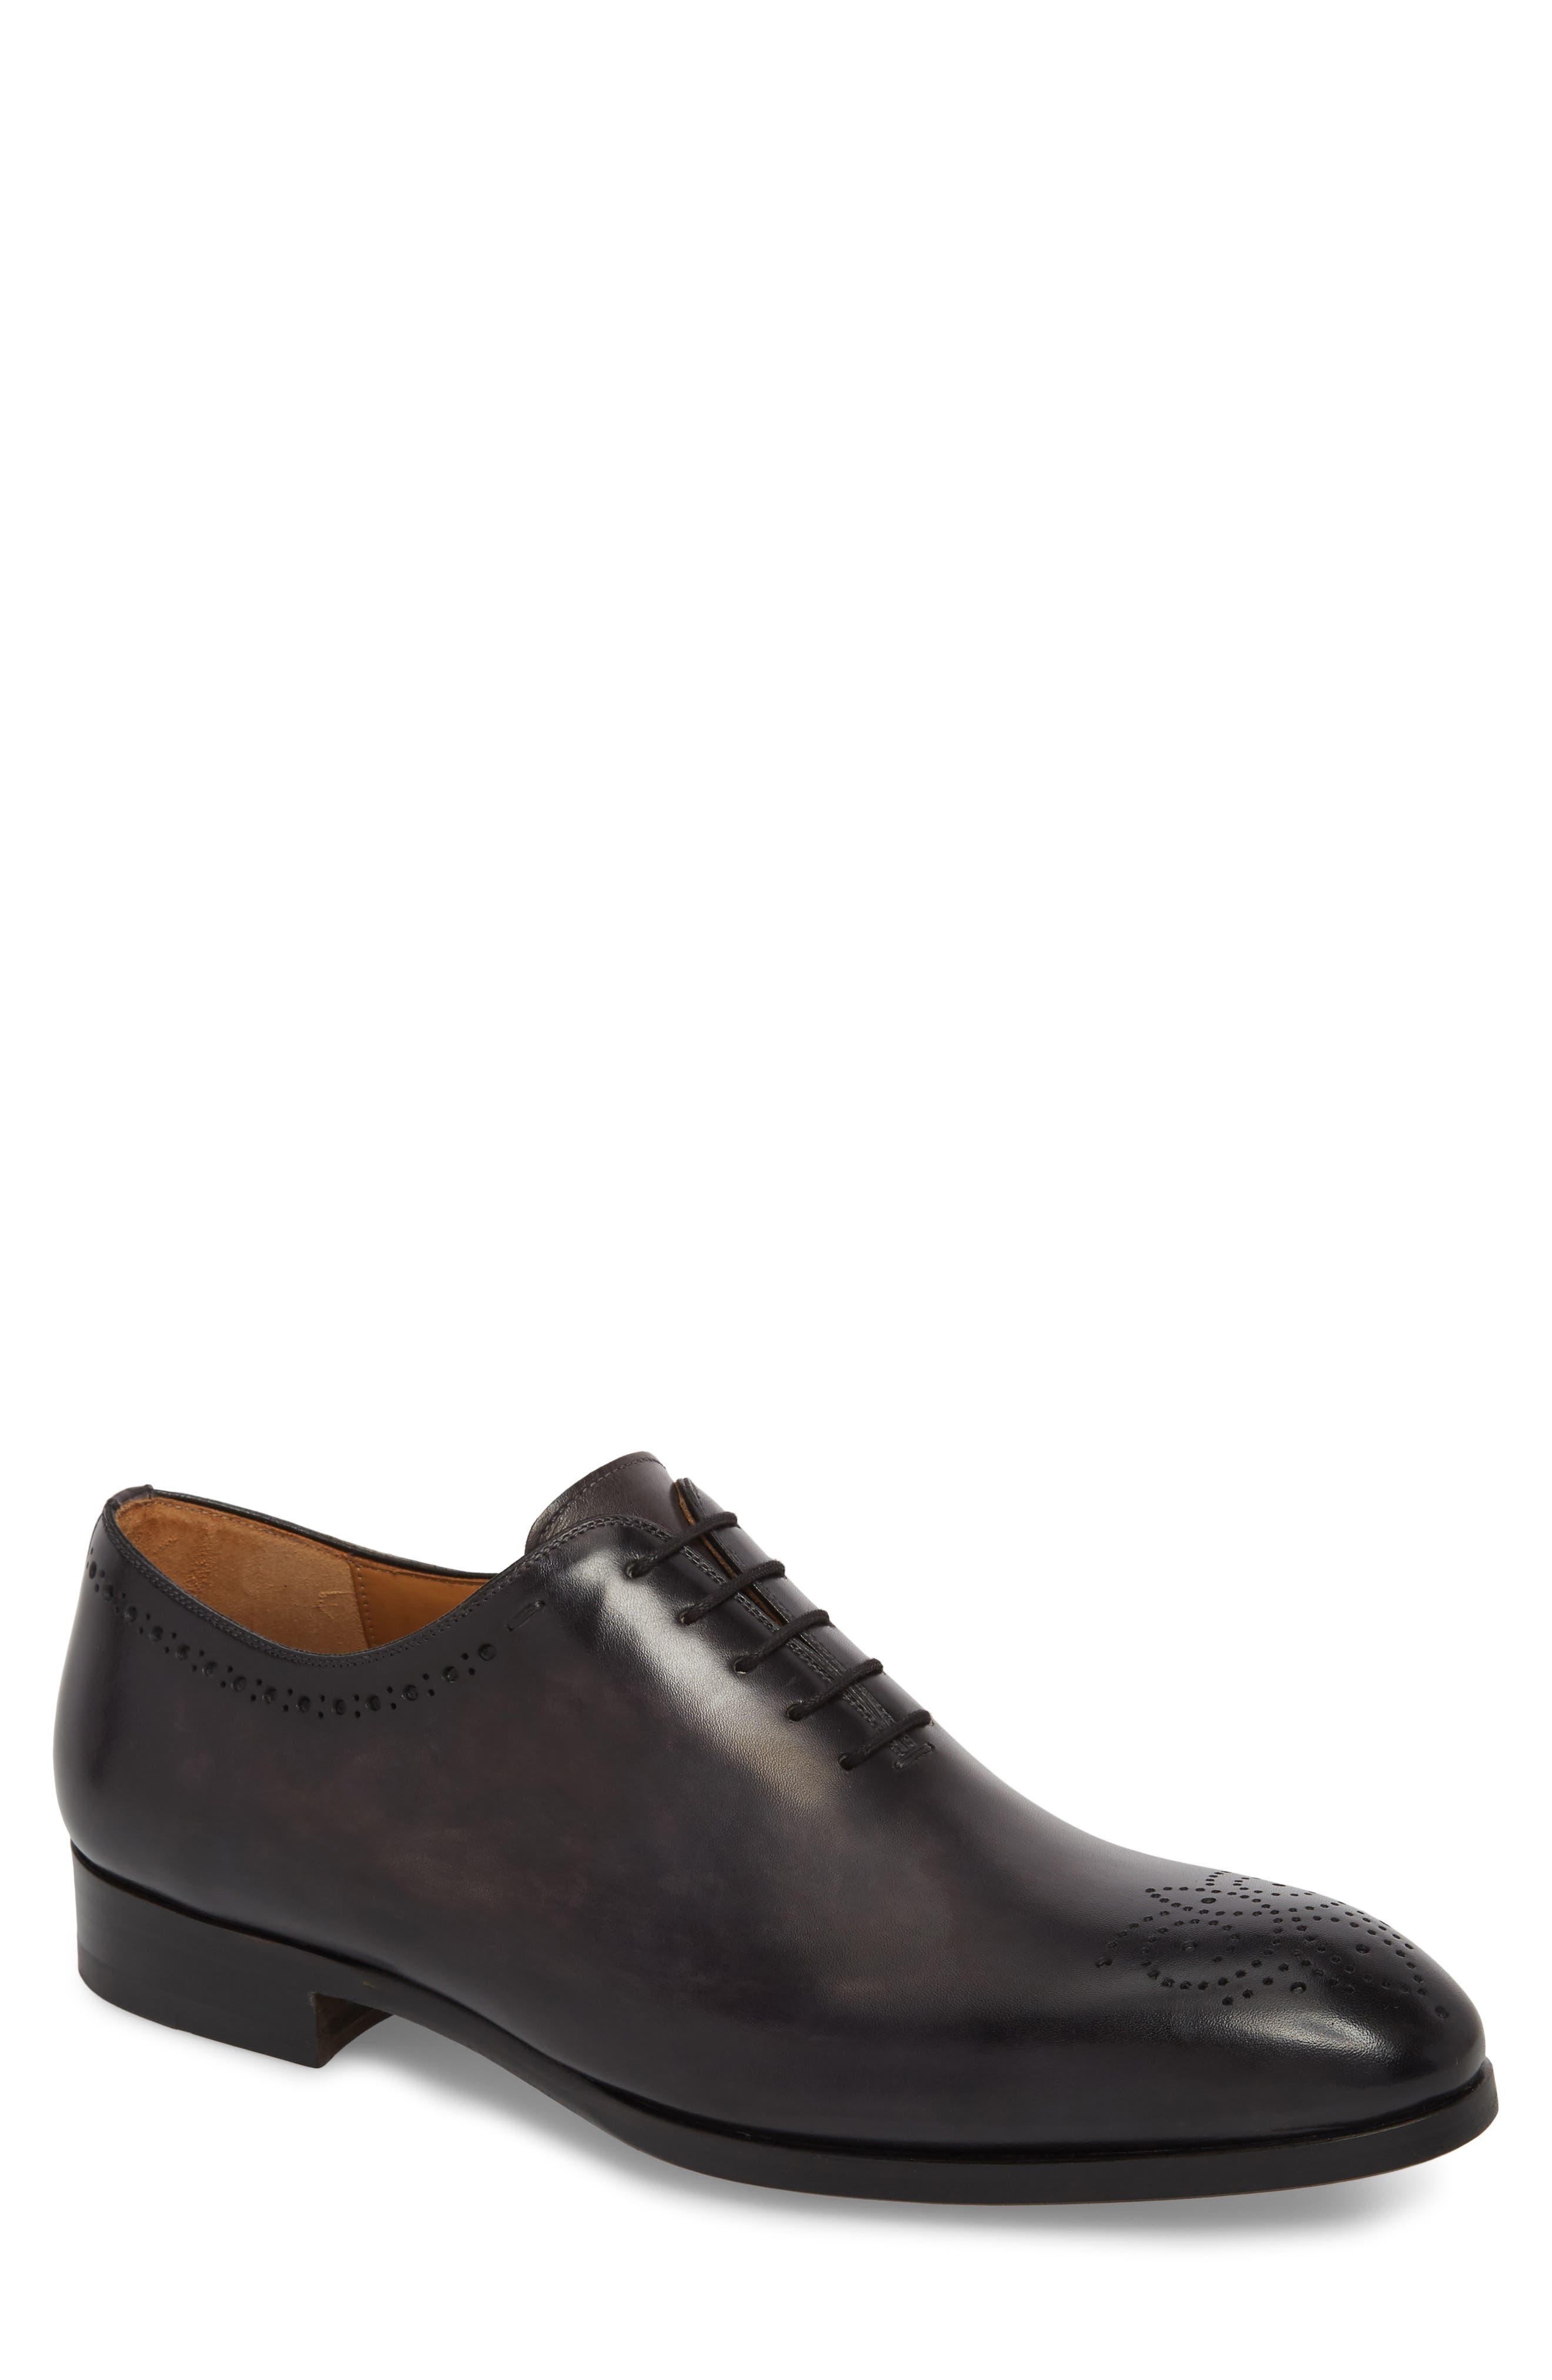 Paolo Brogued Whole Cut Shoe,                         Main,                         color, 020